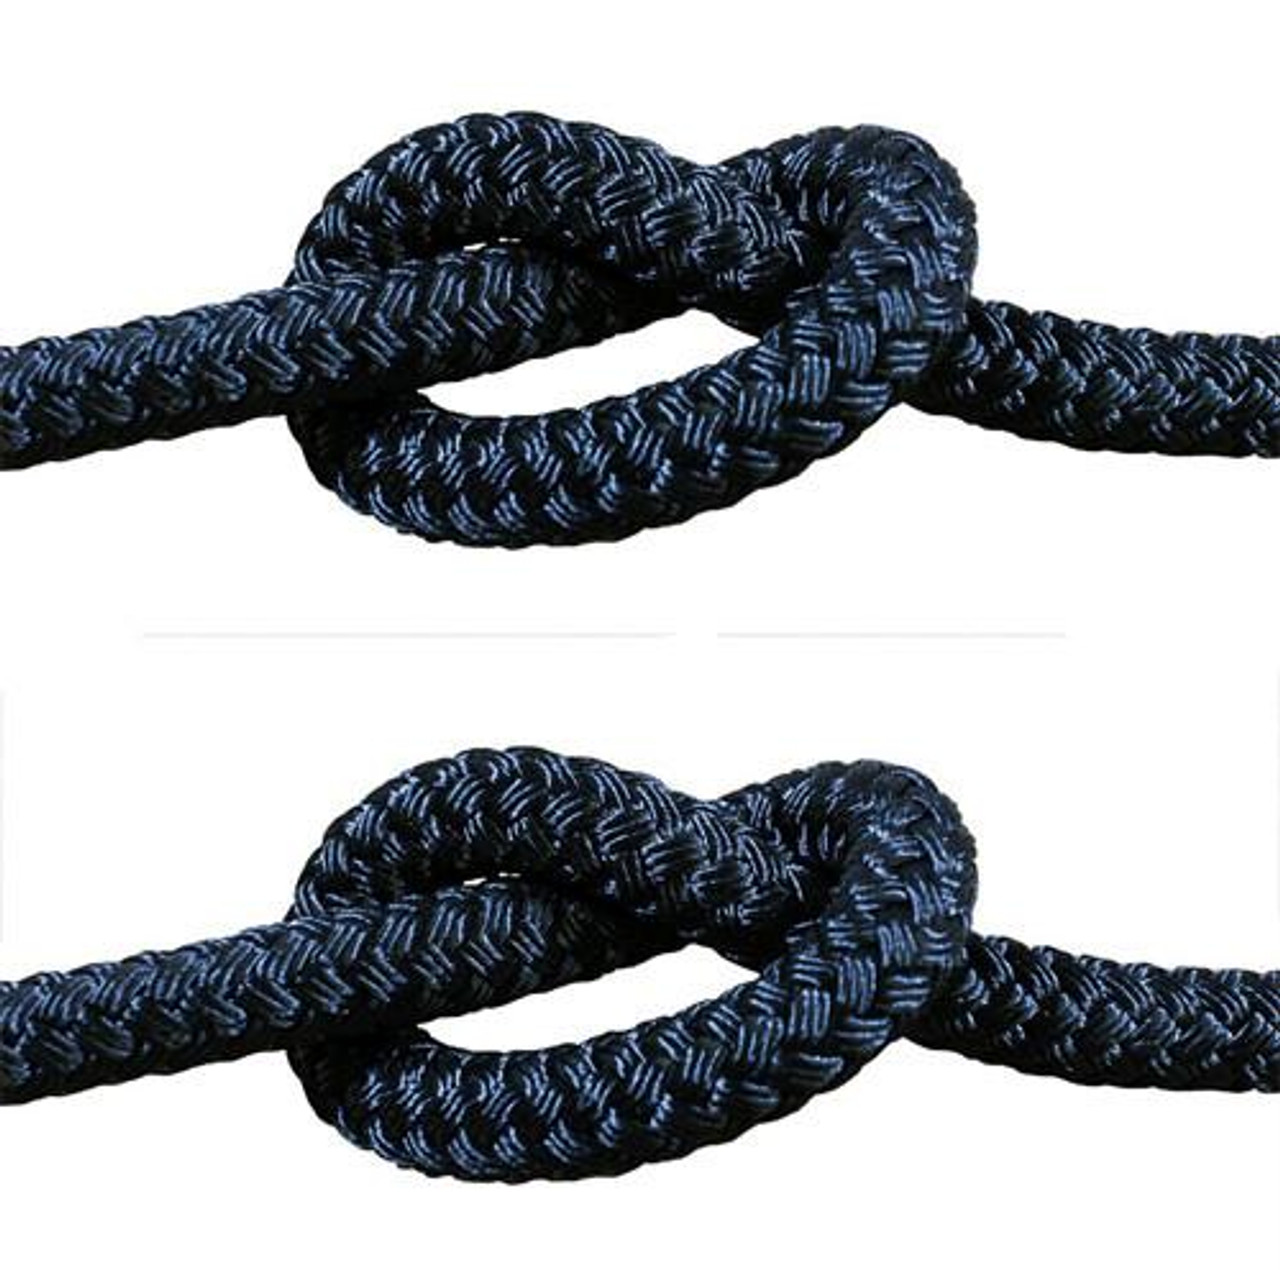 Rope - Double Braid Black 20mm x 1metre